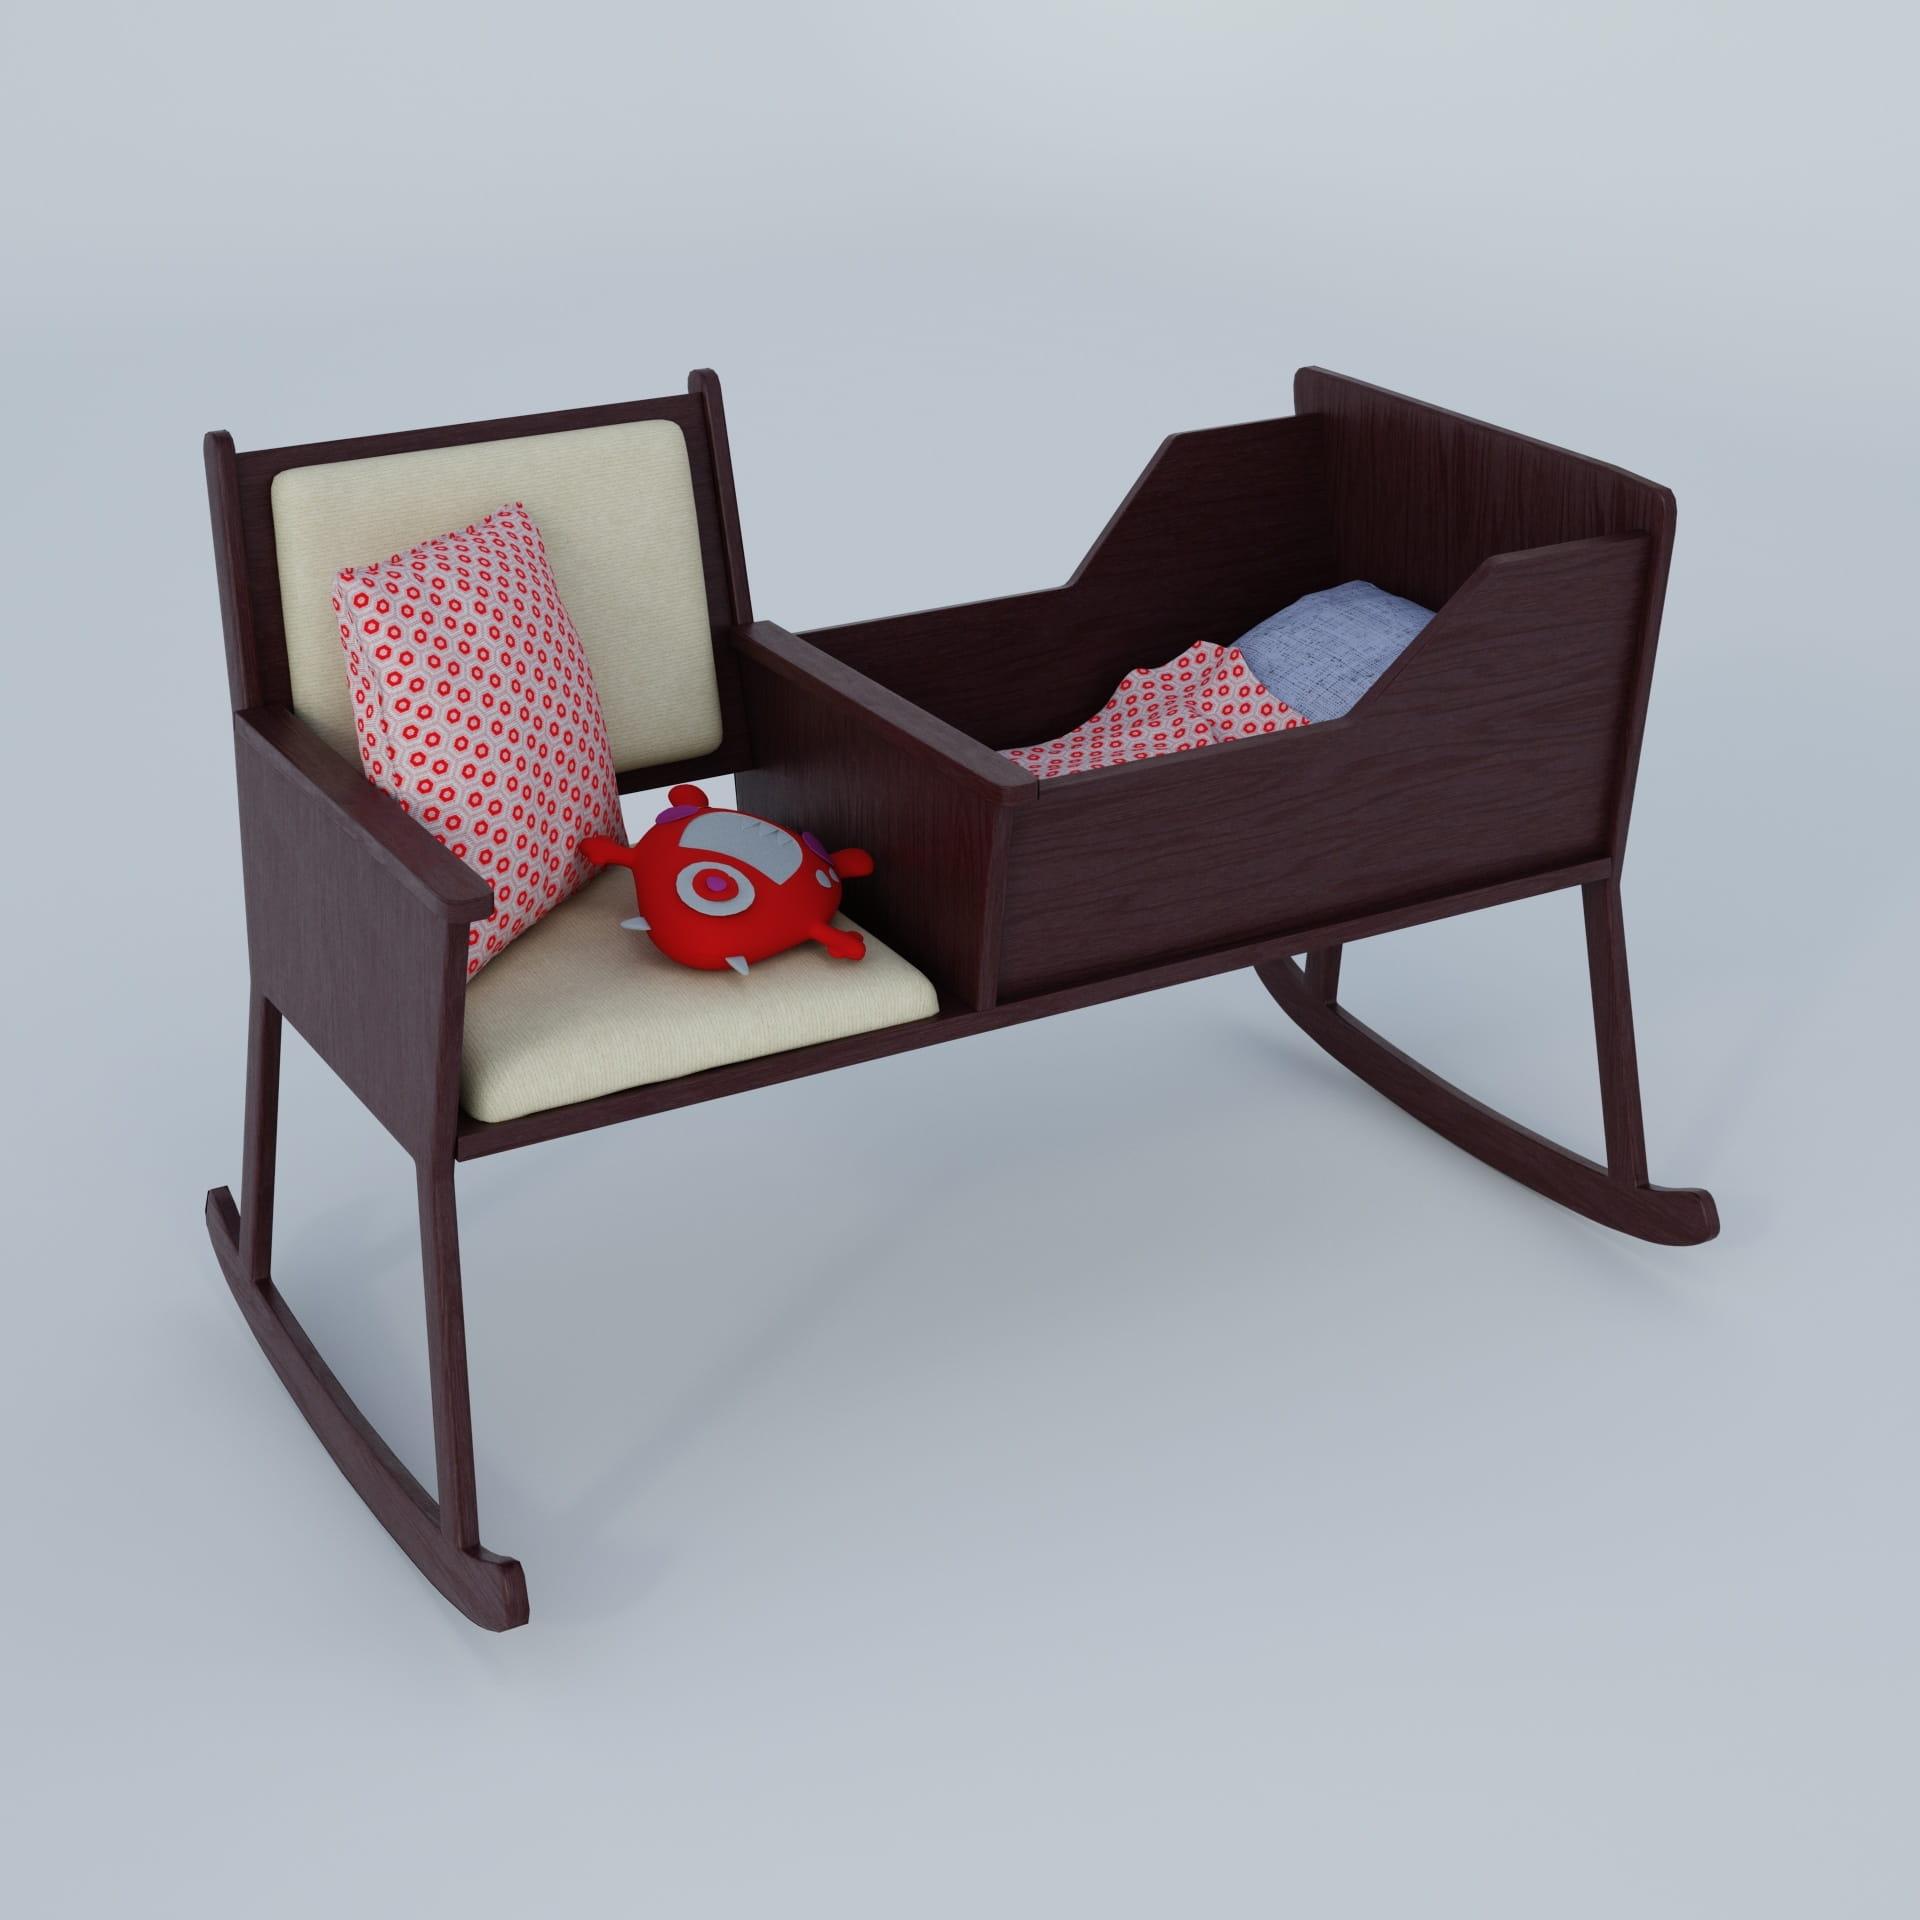 furniture 13 AM244 Archmodels